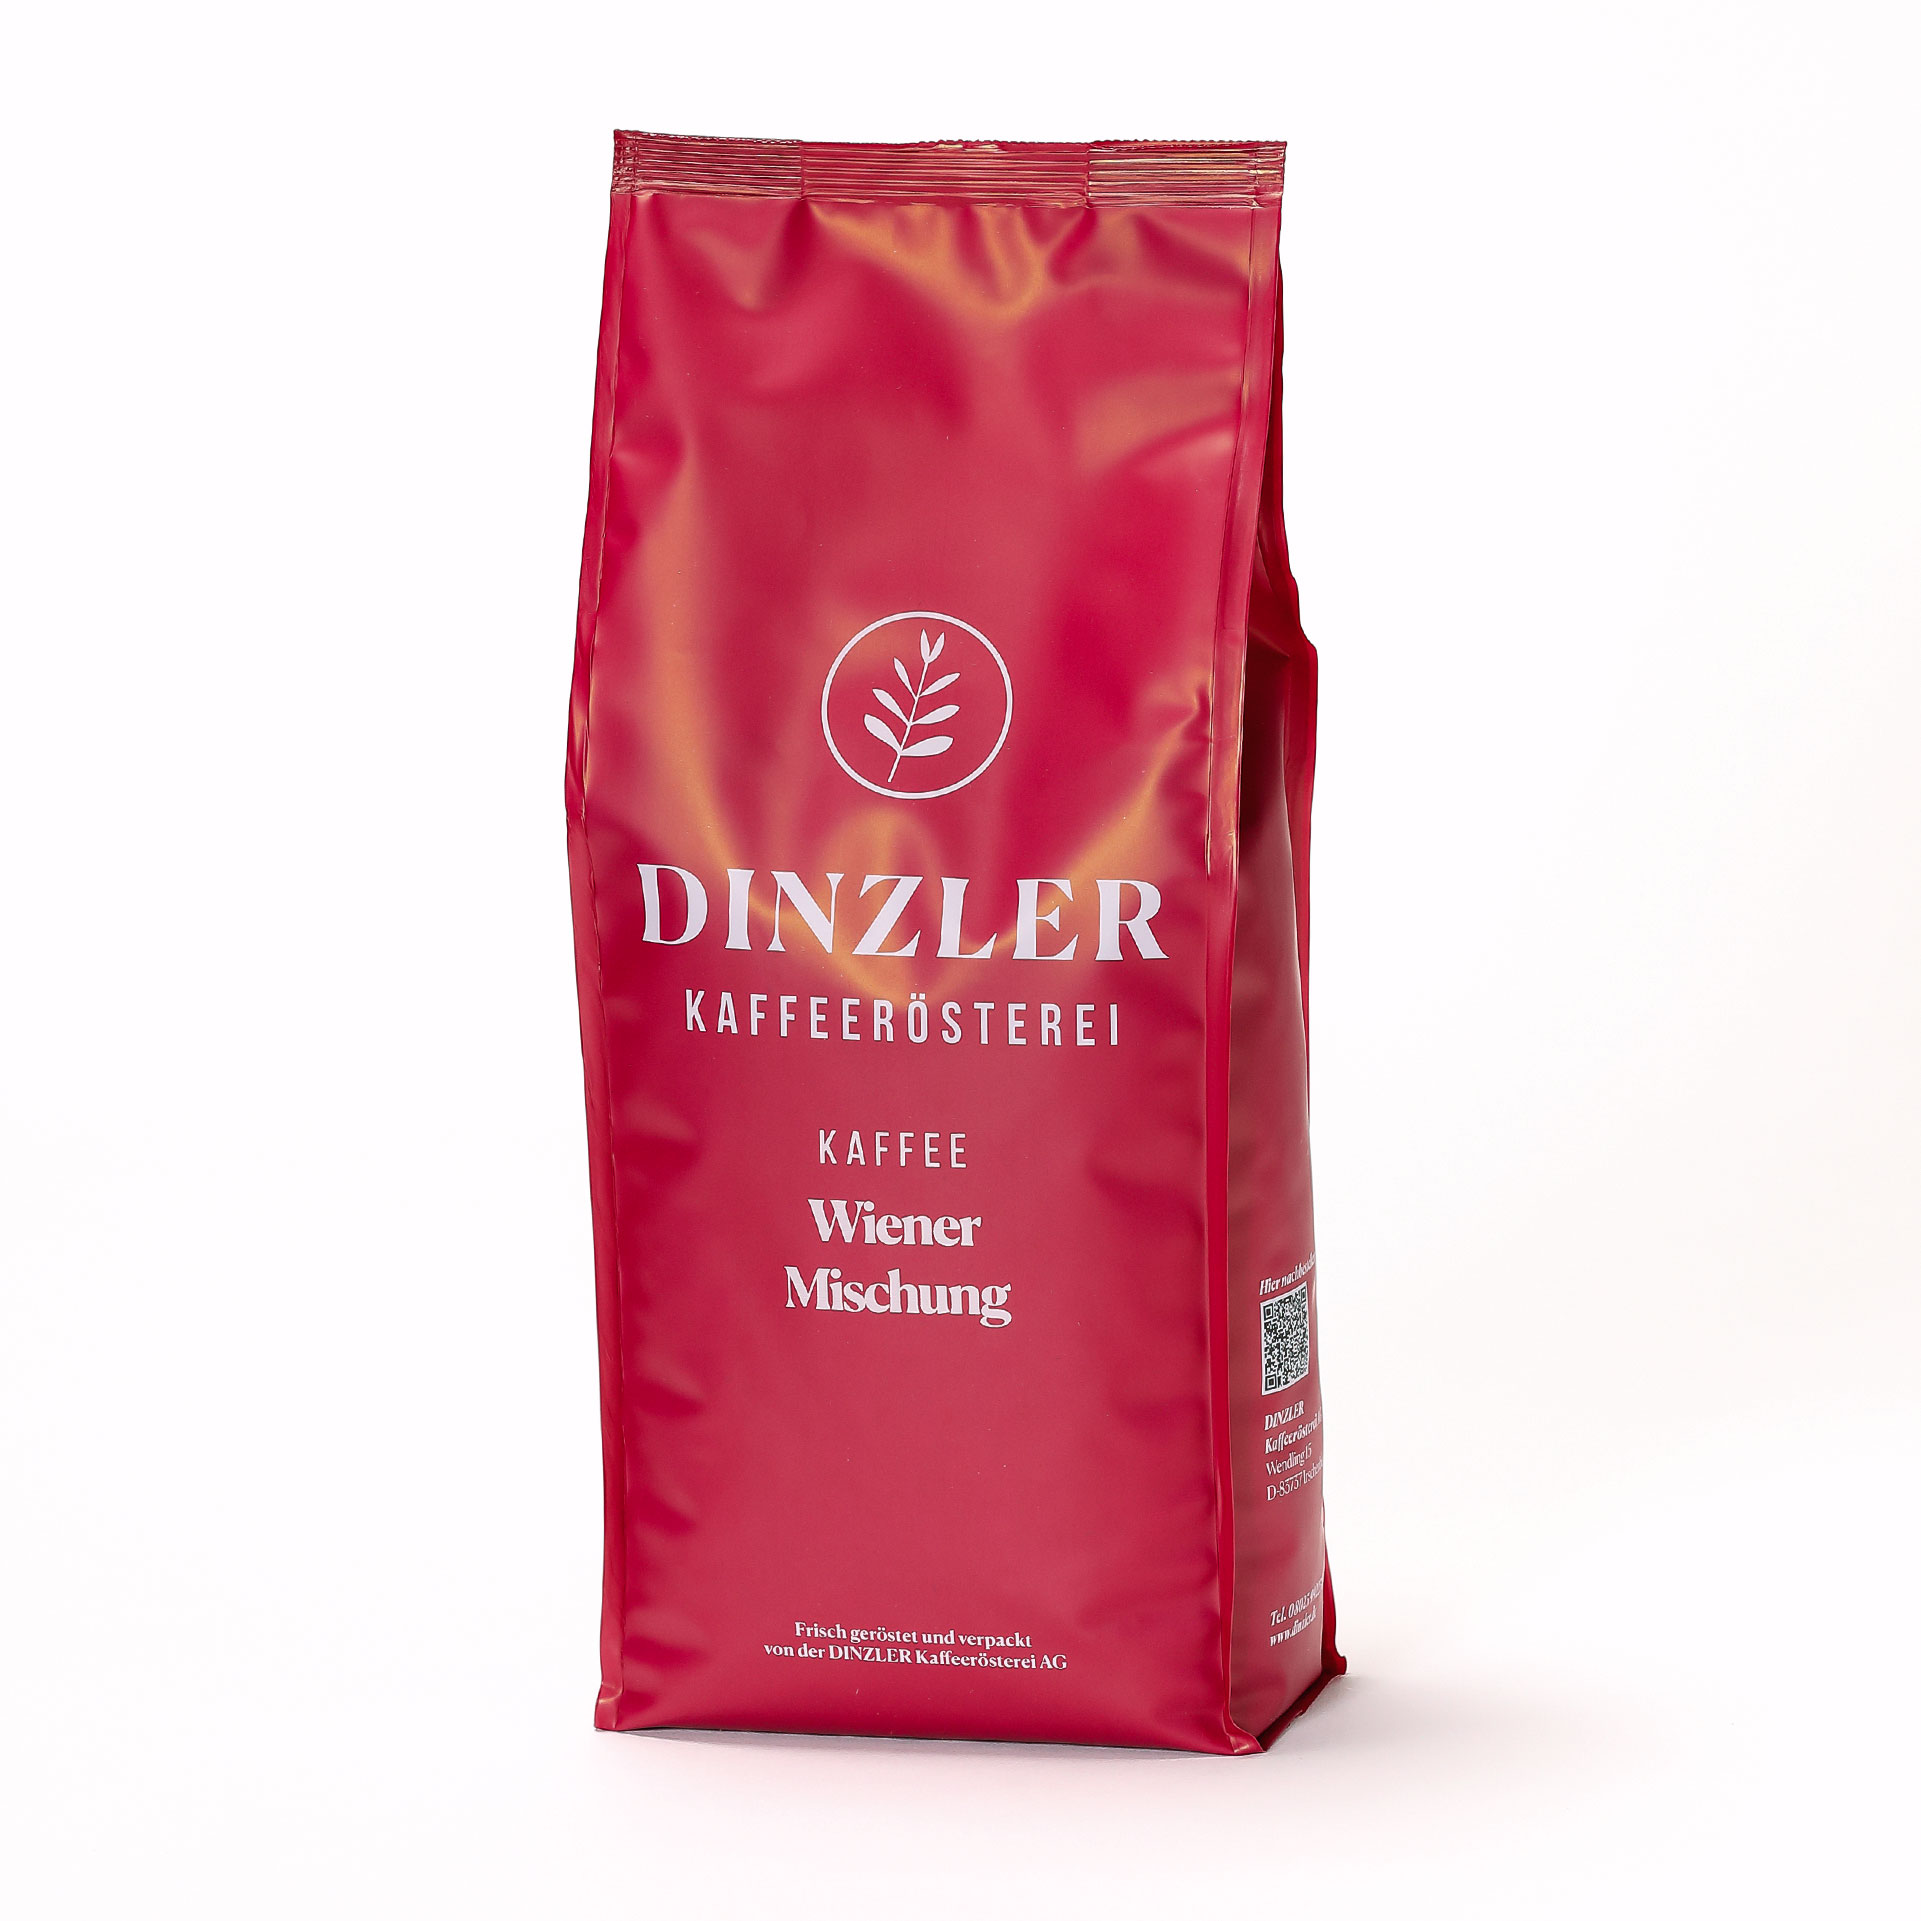 DINZLER Kaffee Wiener Mischung